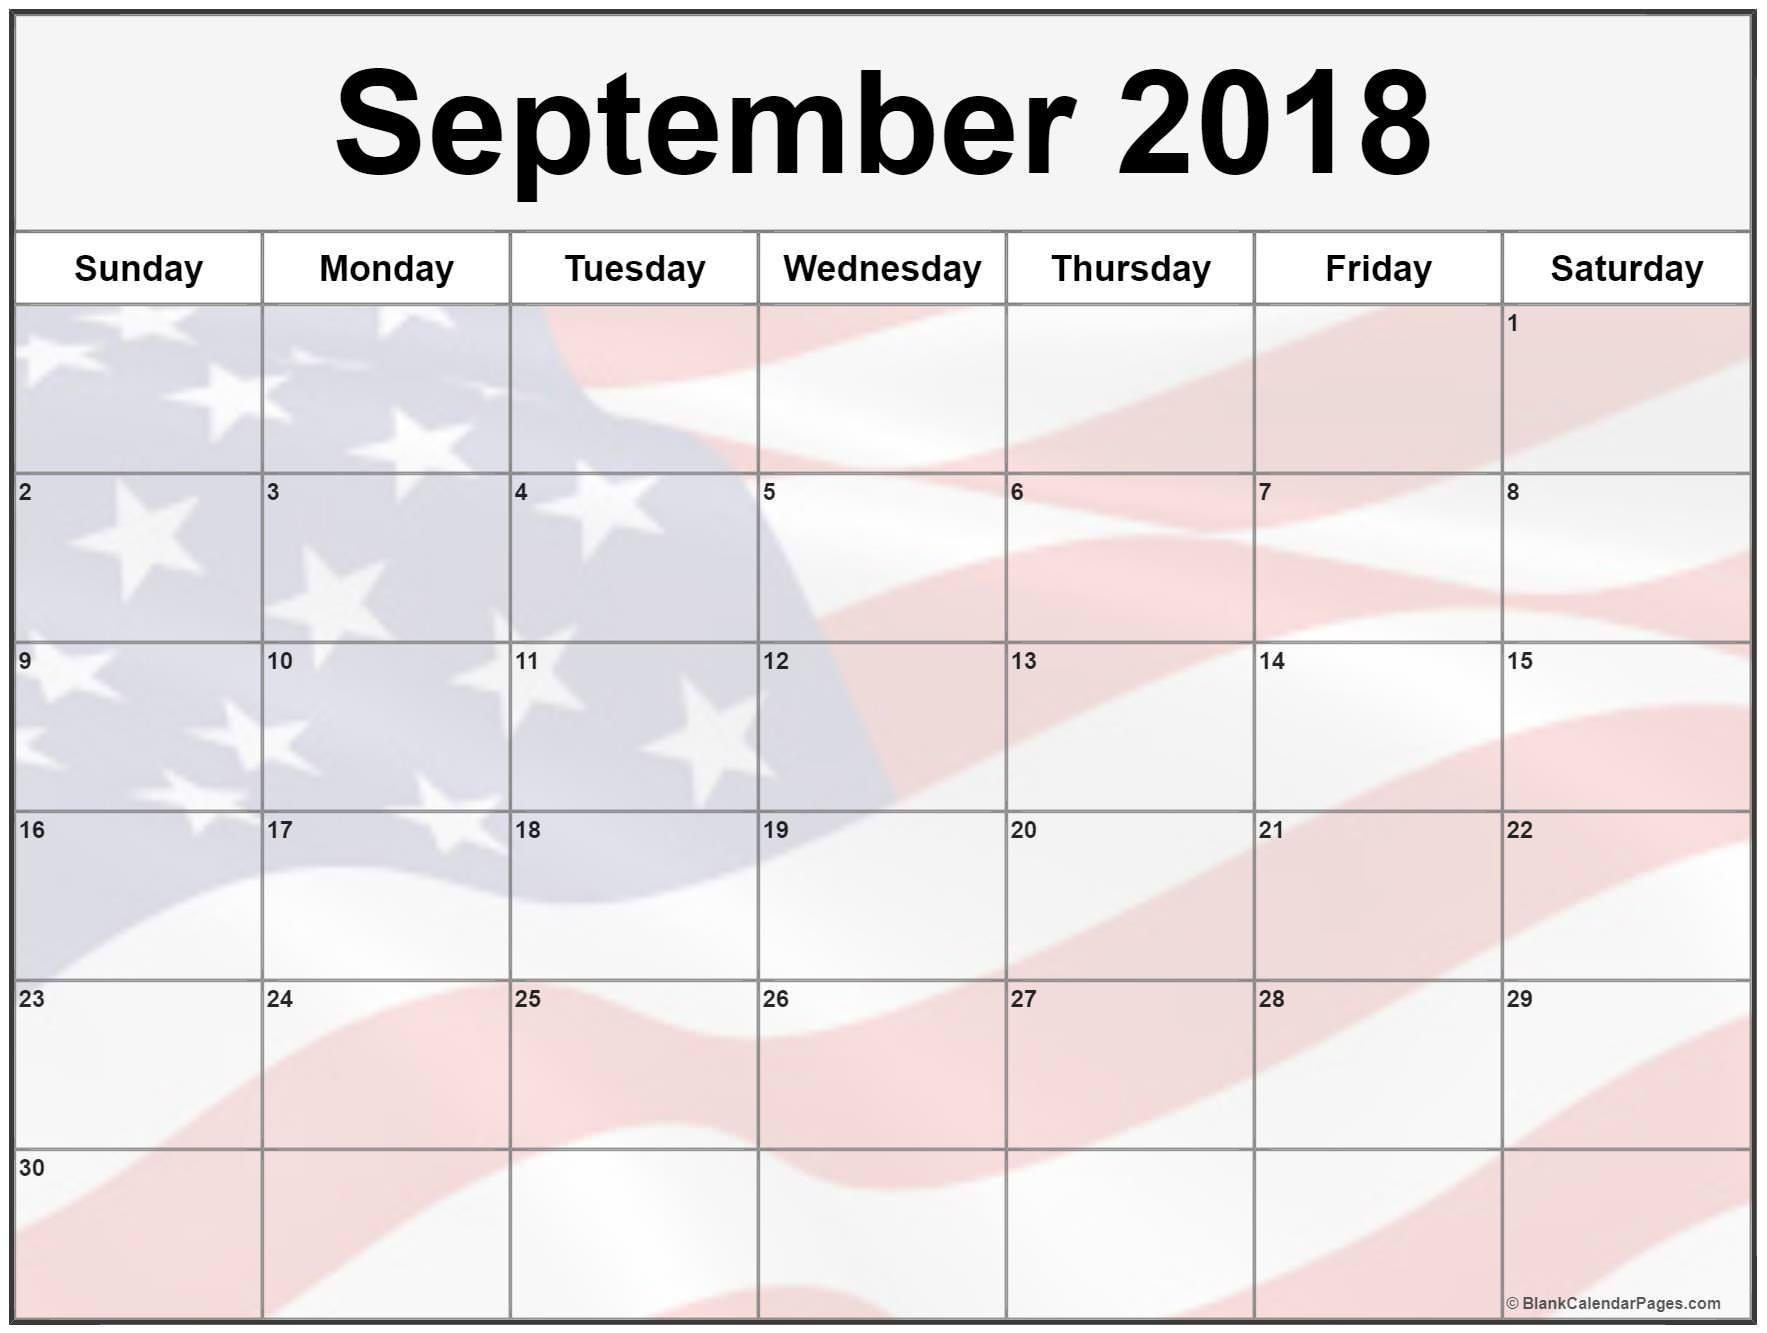 September Calendar 2018 Printable Blank Calendar With US